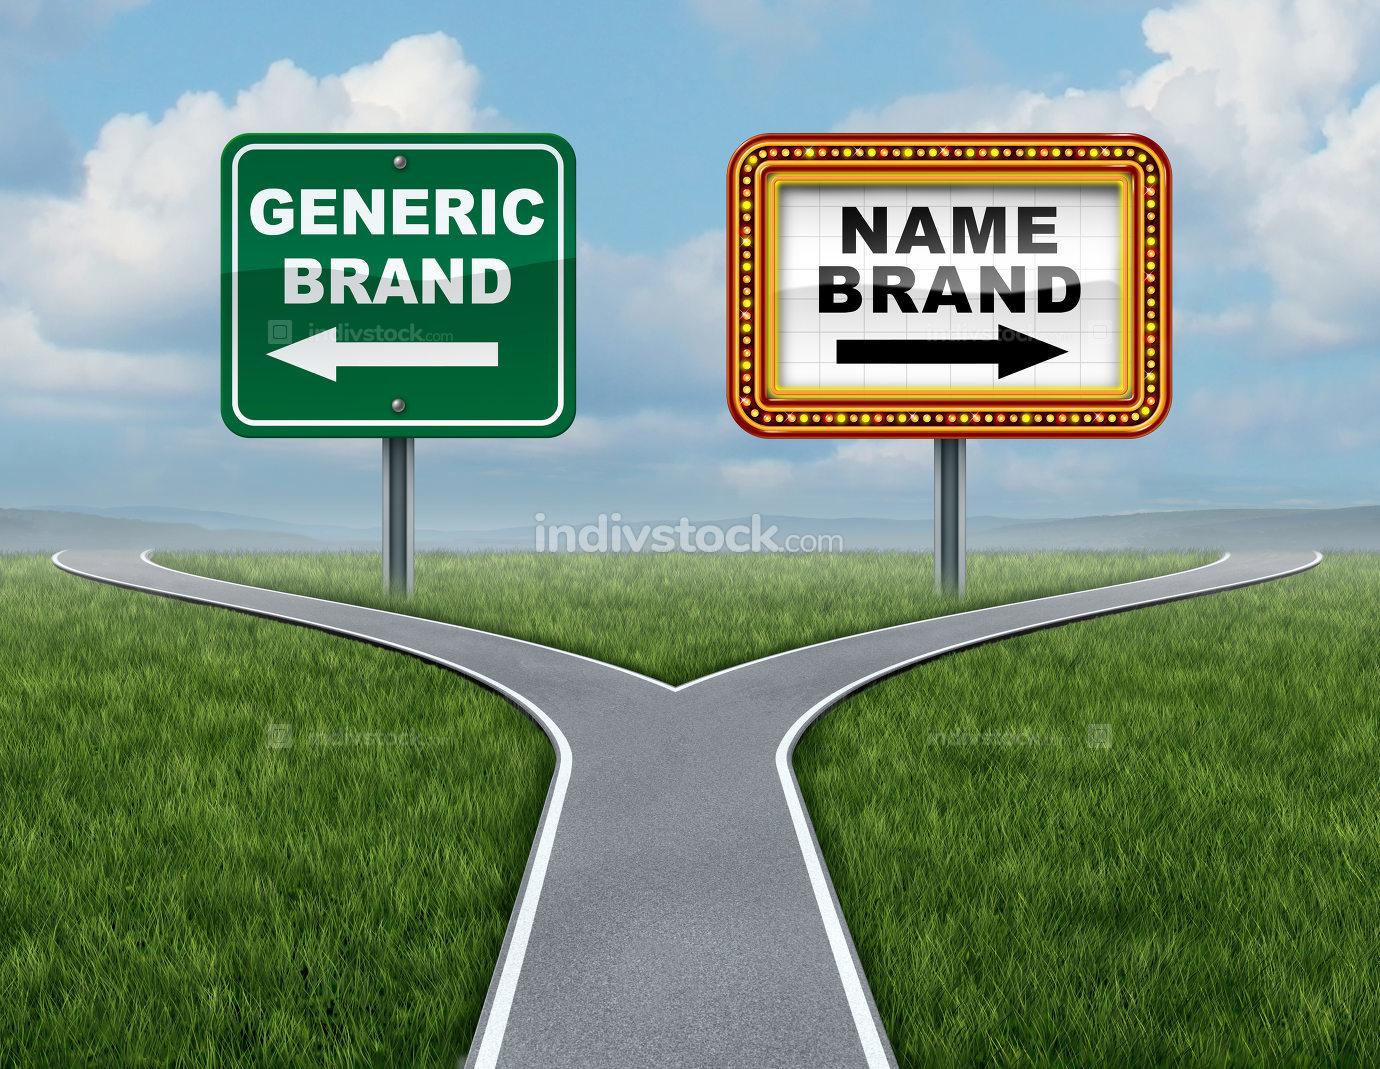 Generic Brand Versus Brand Name